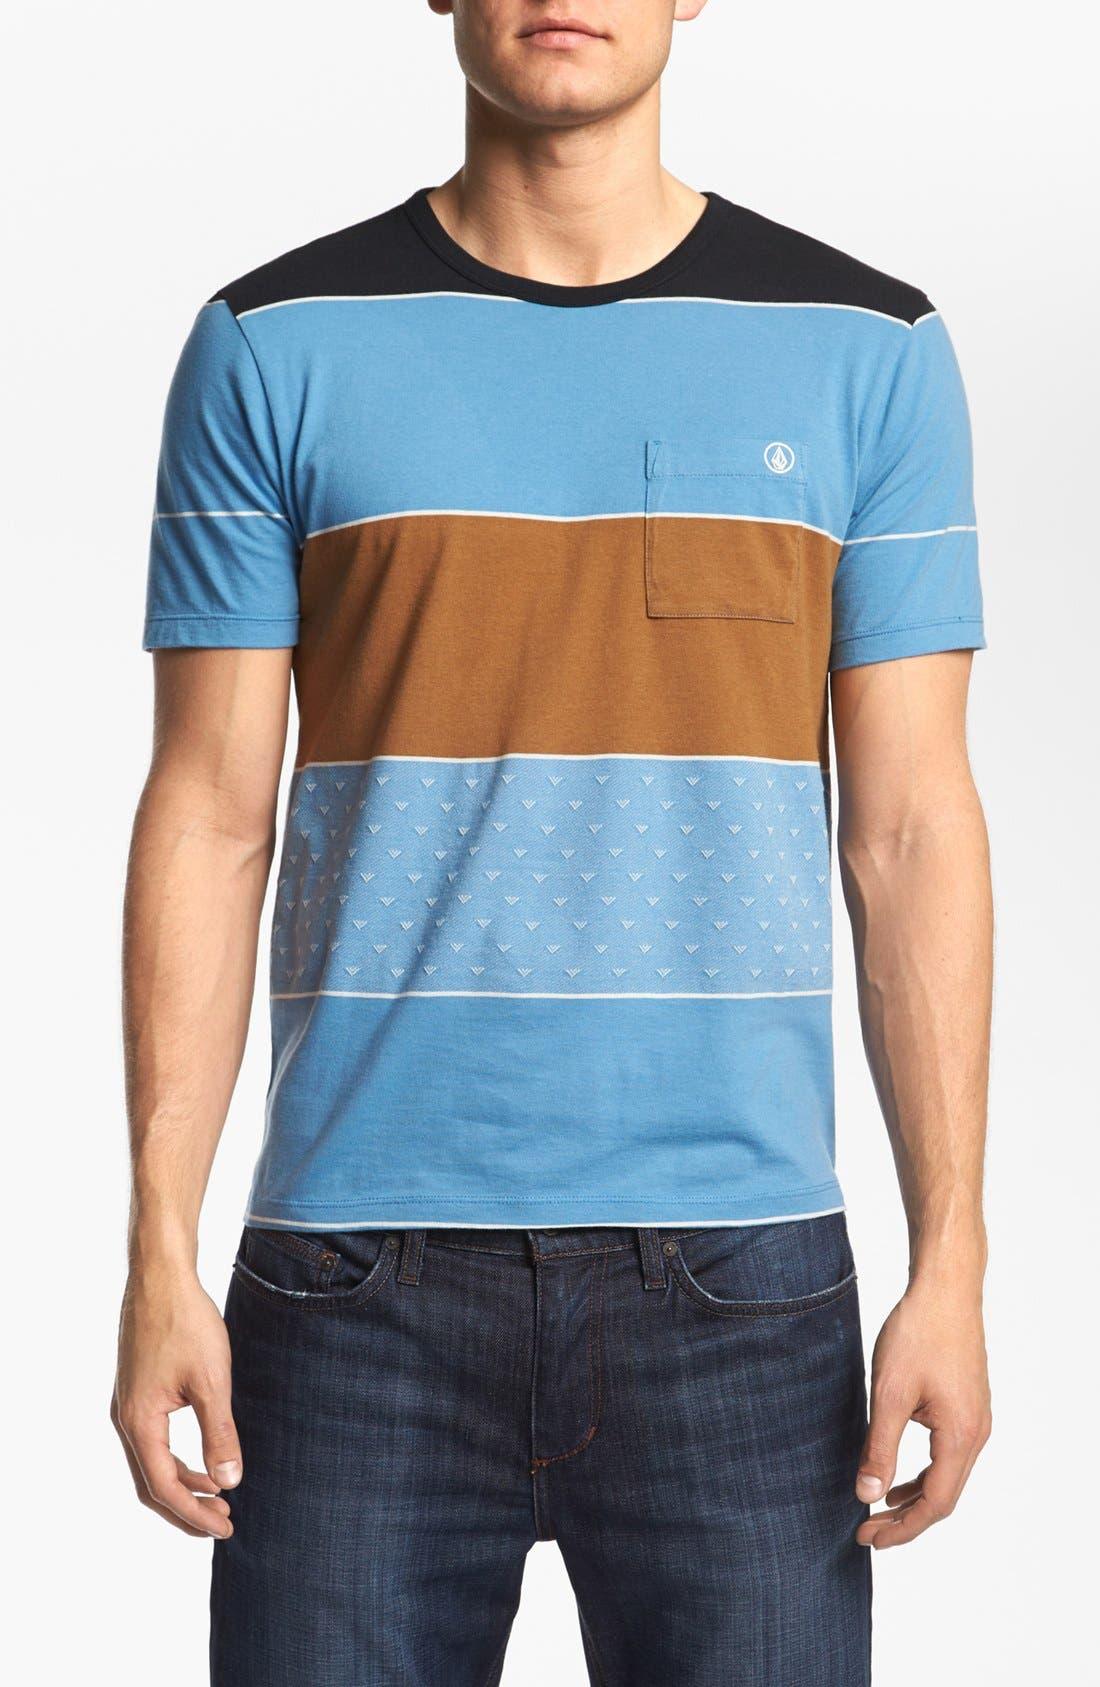 Alternate Image 1 Selected - Volcom 'Dornio' T-Shirt